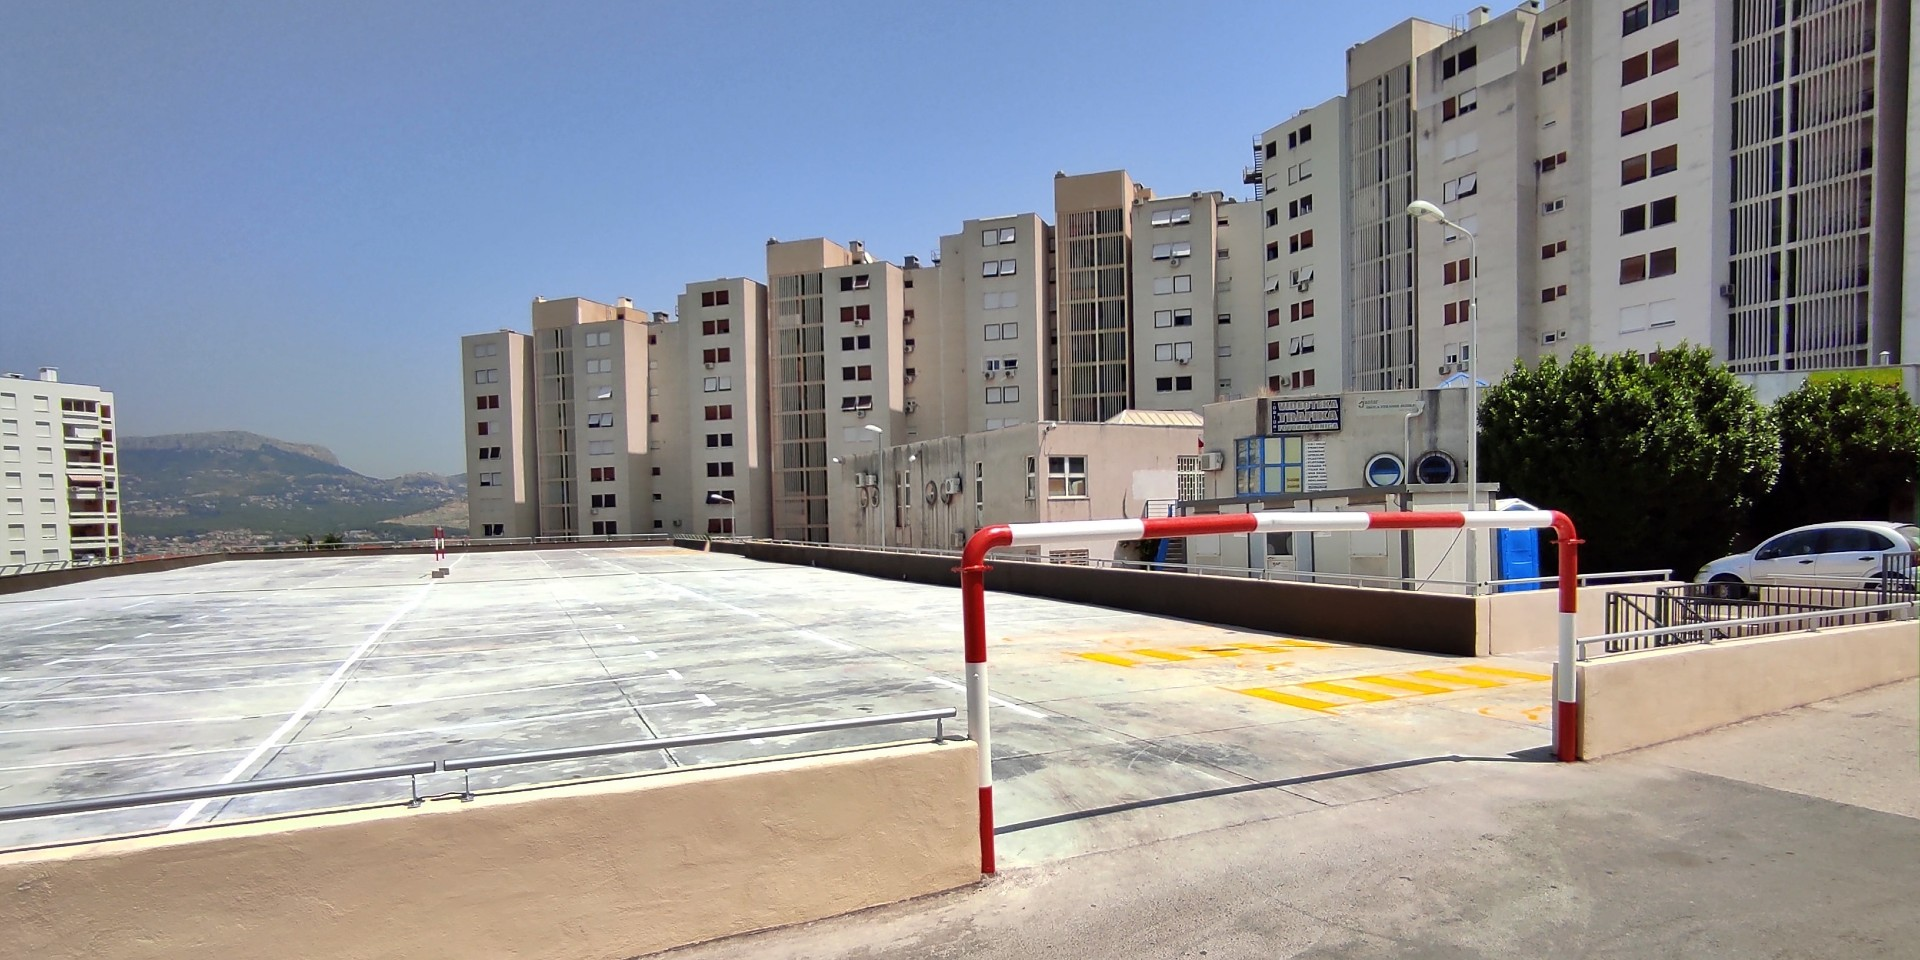 SPLIT PARKING: Završena sanacija garaže 'Pujanke I'